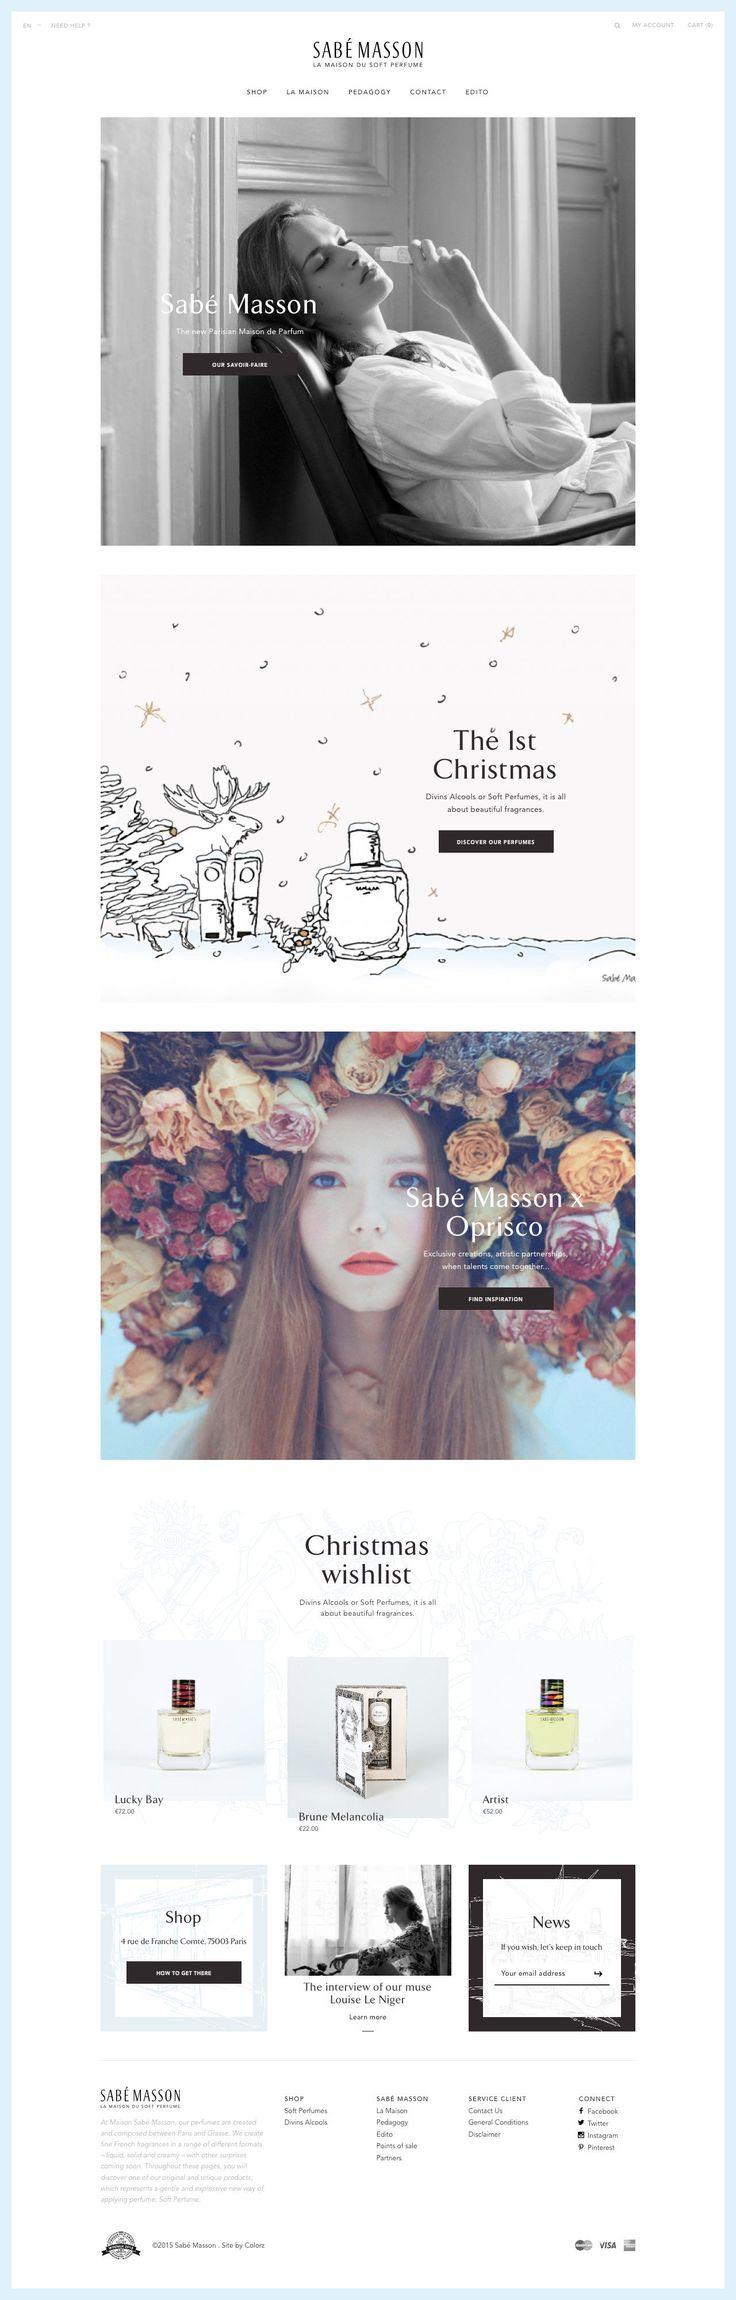 Sabé Masson (More web design inspiration at topdesigninspiration.com) #design #web #webdesign #inspiration #sitedesign #responsive